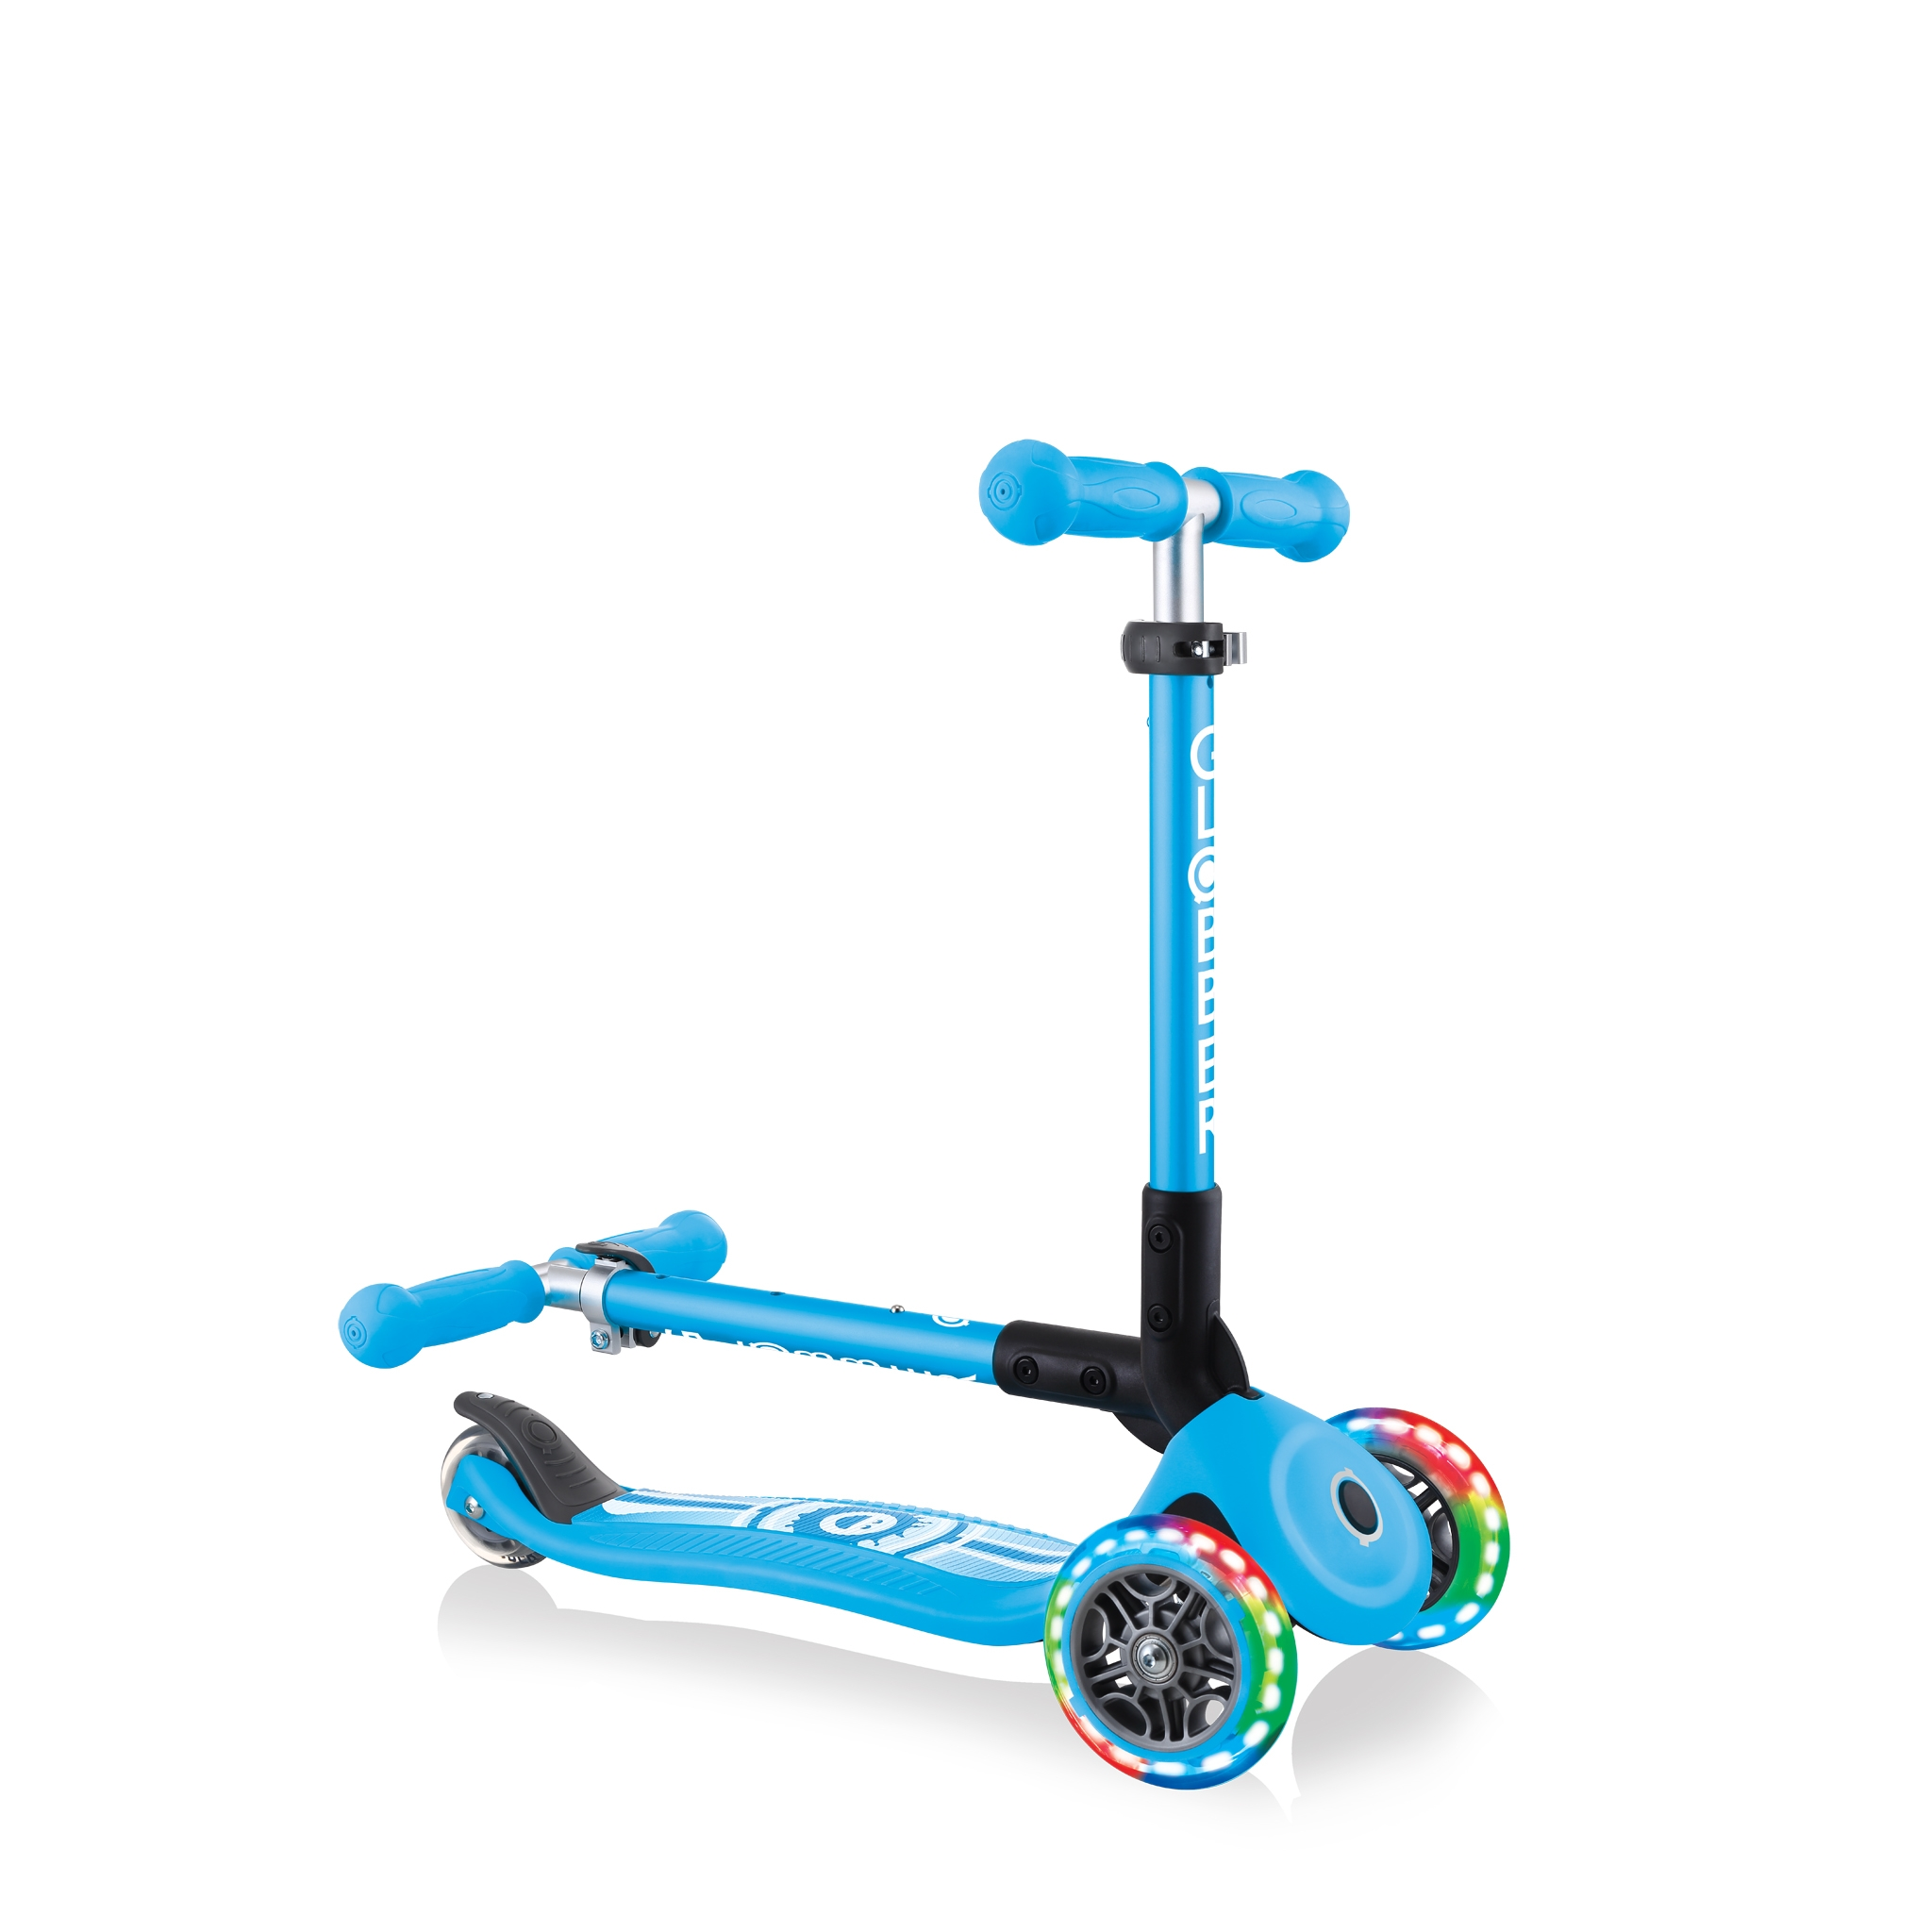 Foldable-3-wheel-scooter-for-toddlers-Globber-JUNIOR-FOLDABLE-FANTASY-LIGHTS 4